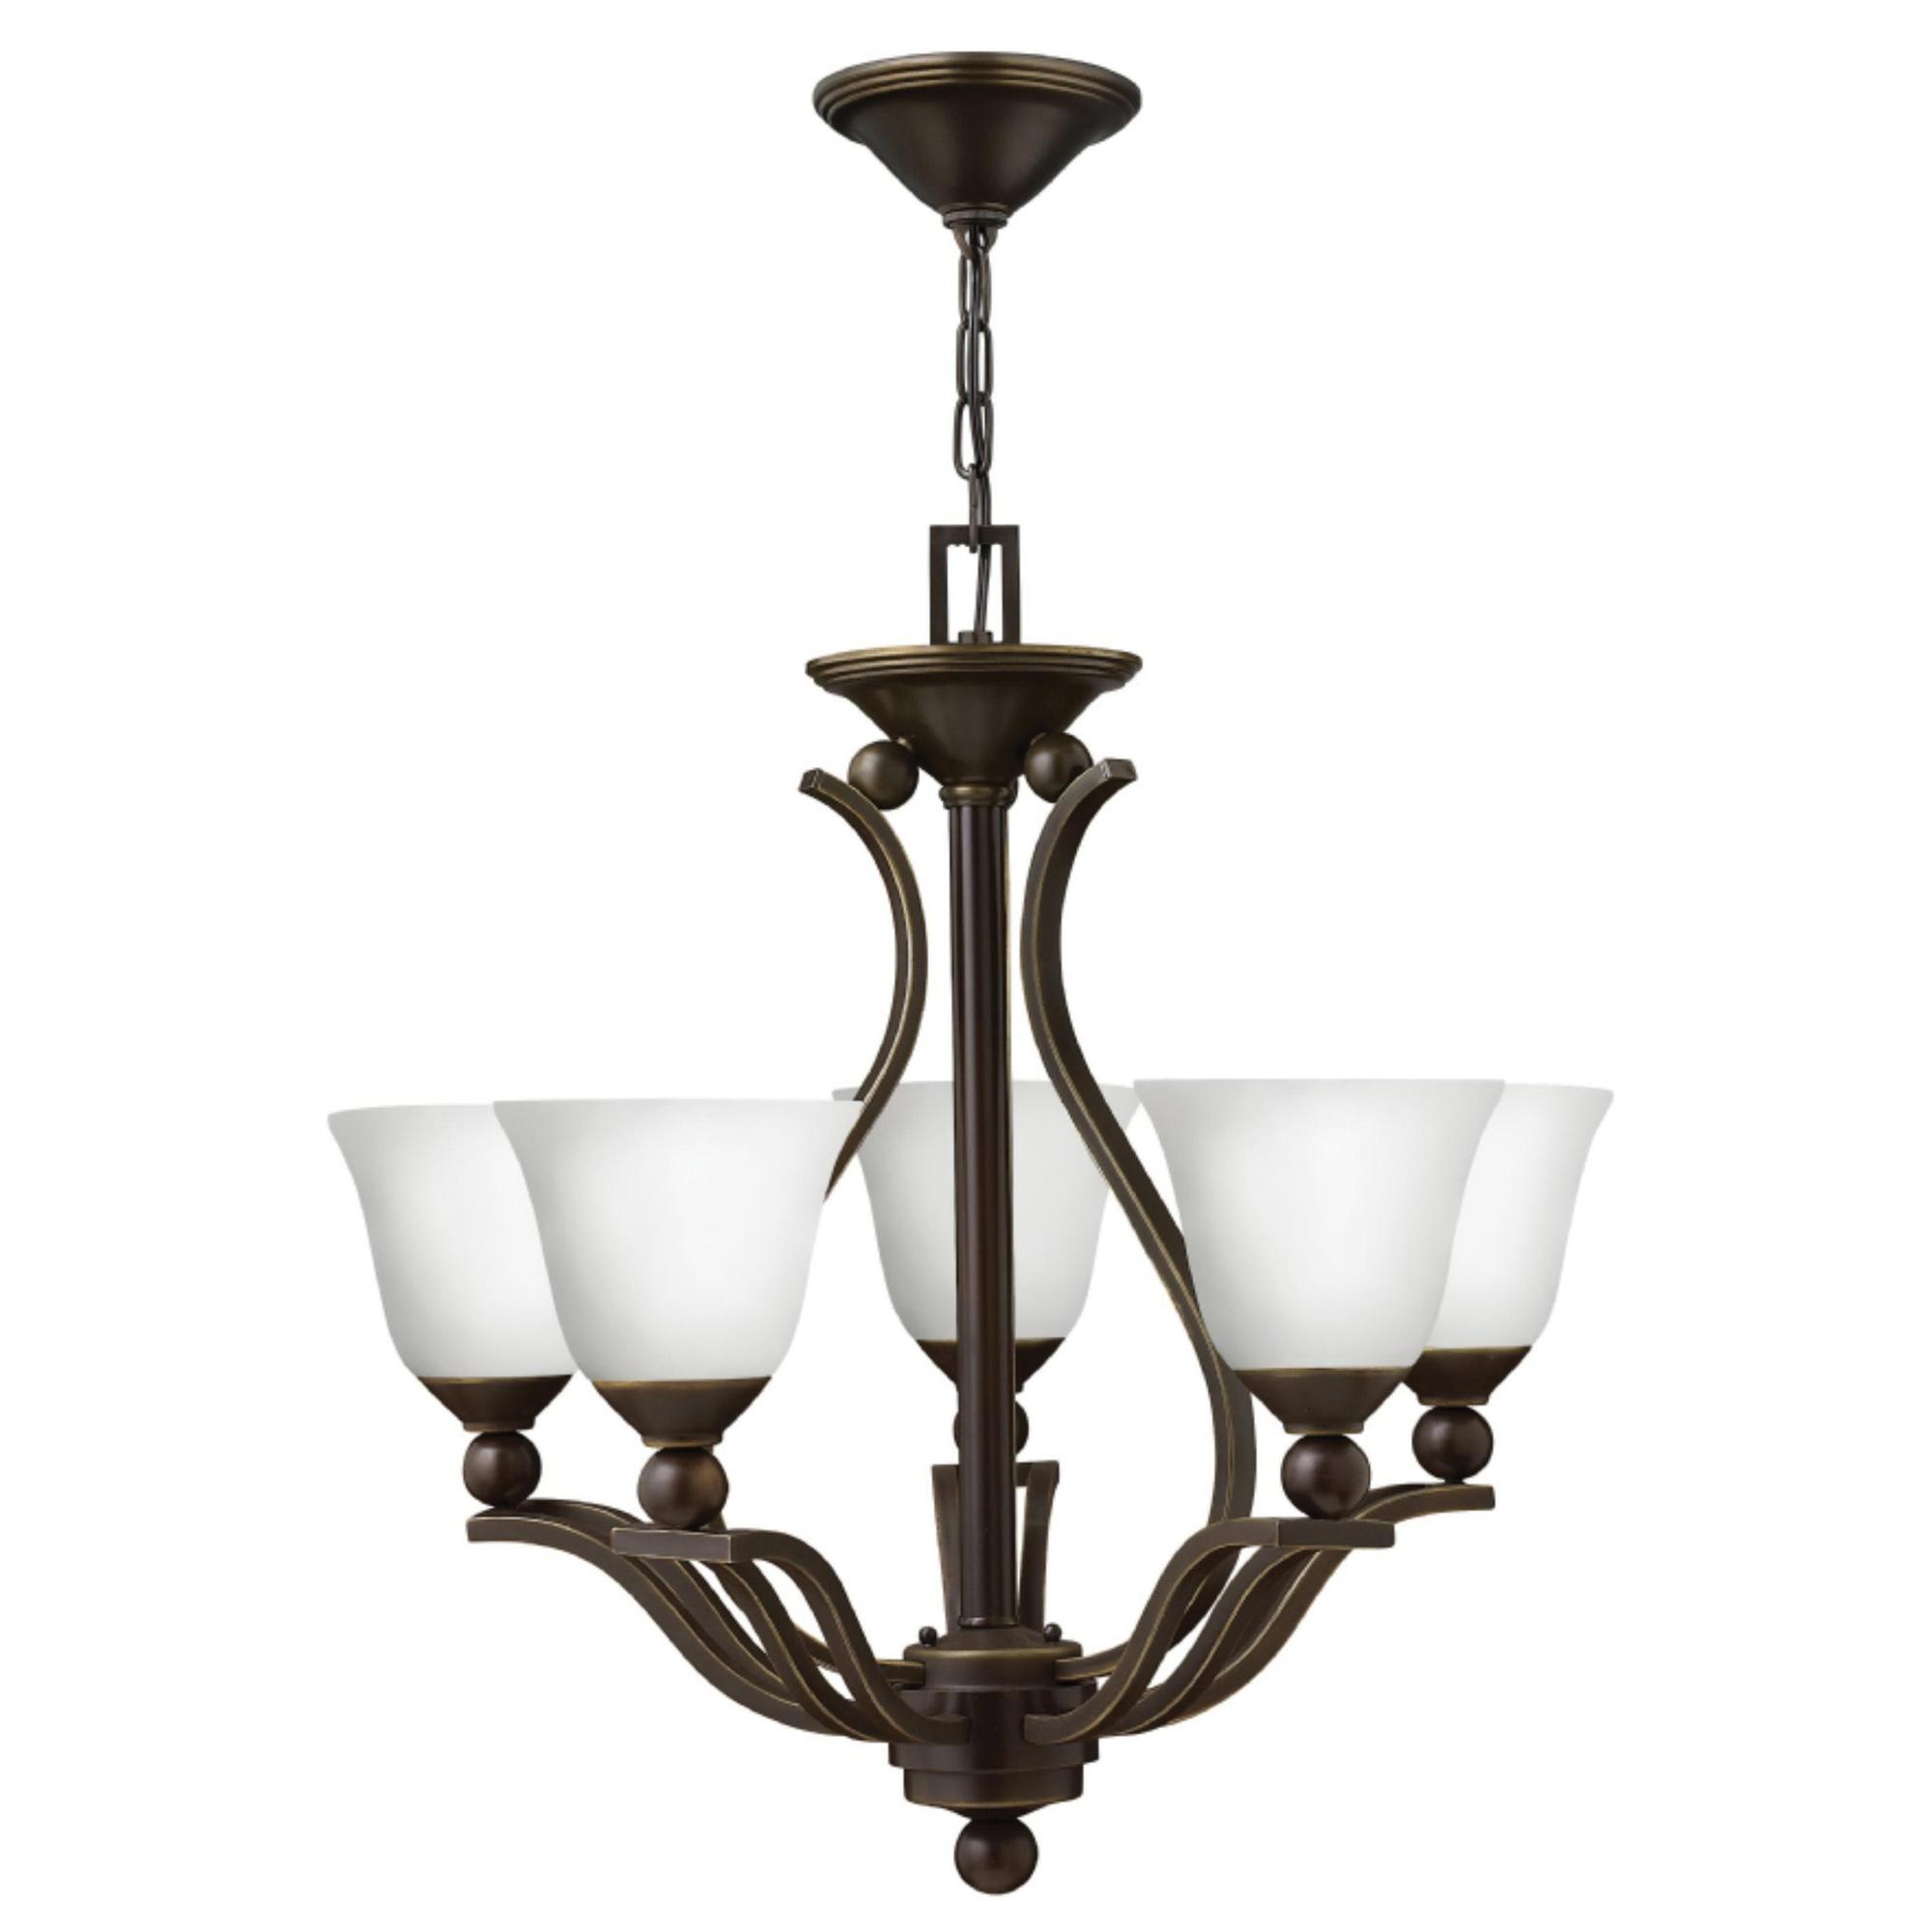 Hinkley Lighting 4655ob Opal 5 Light Up Chandelier 100 Watt 120 Volt Olde Bronze Bolla